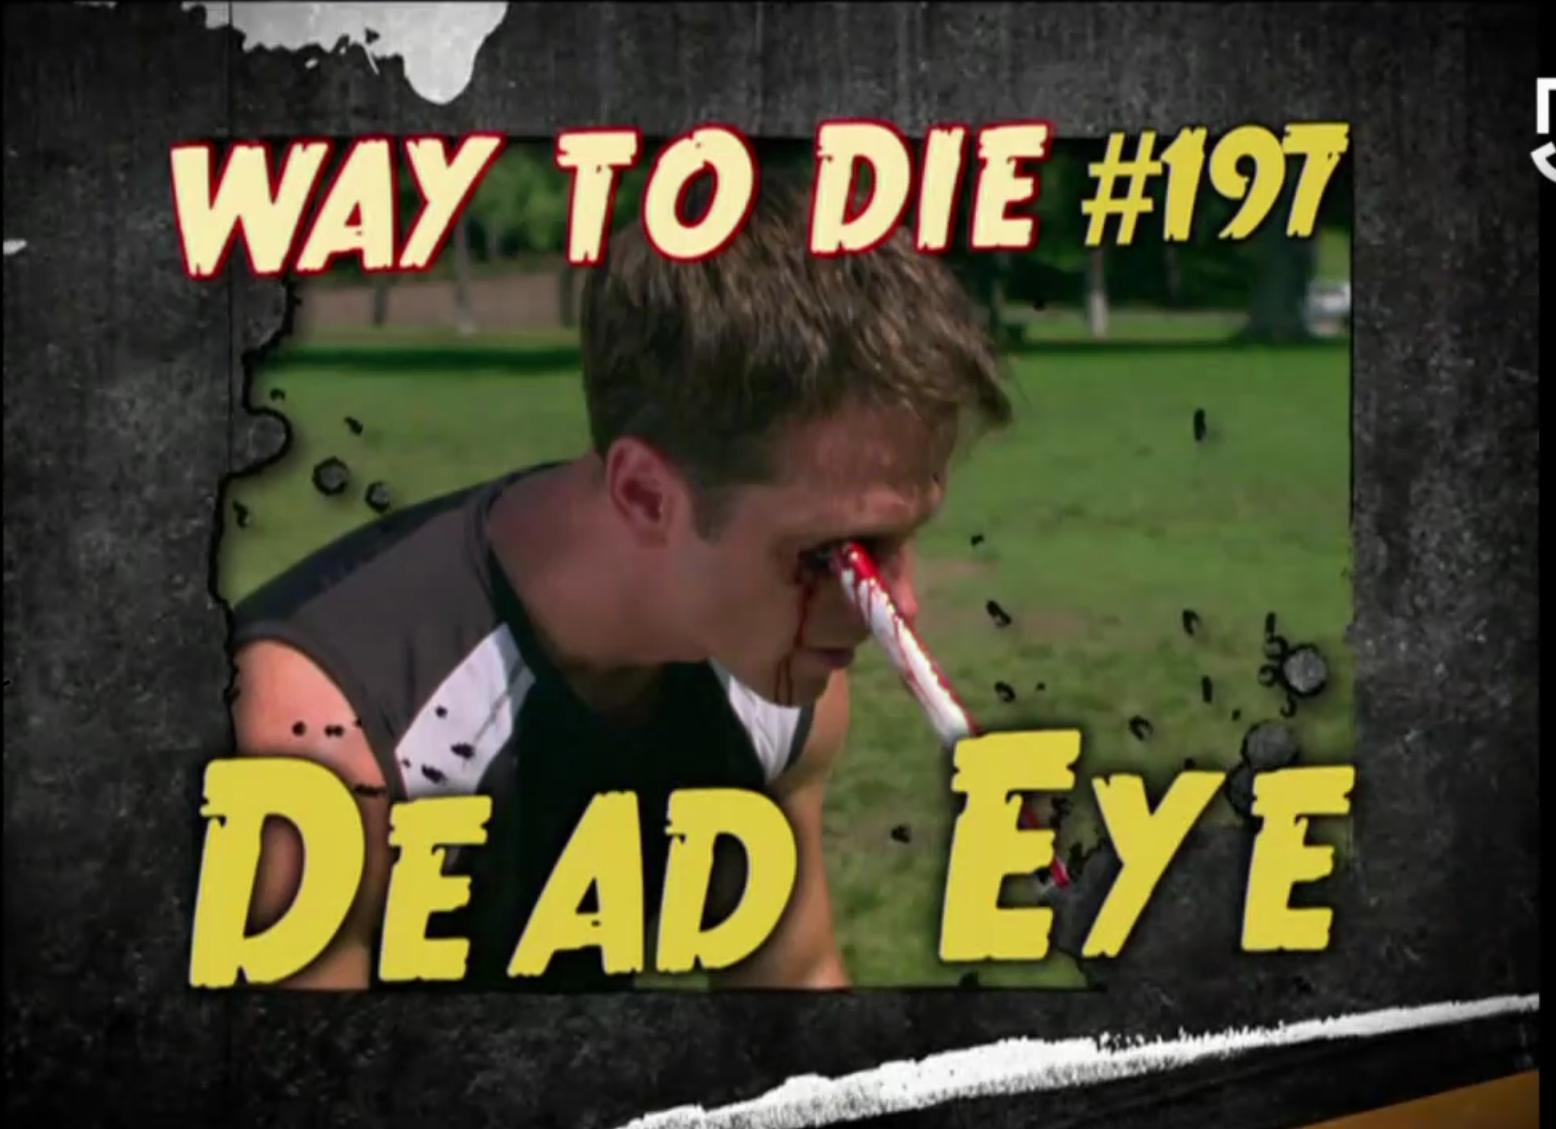 Dead Eye | 1000 Ways To Die Wiki | FANDOM powered by Wikia